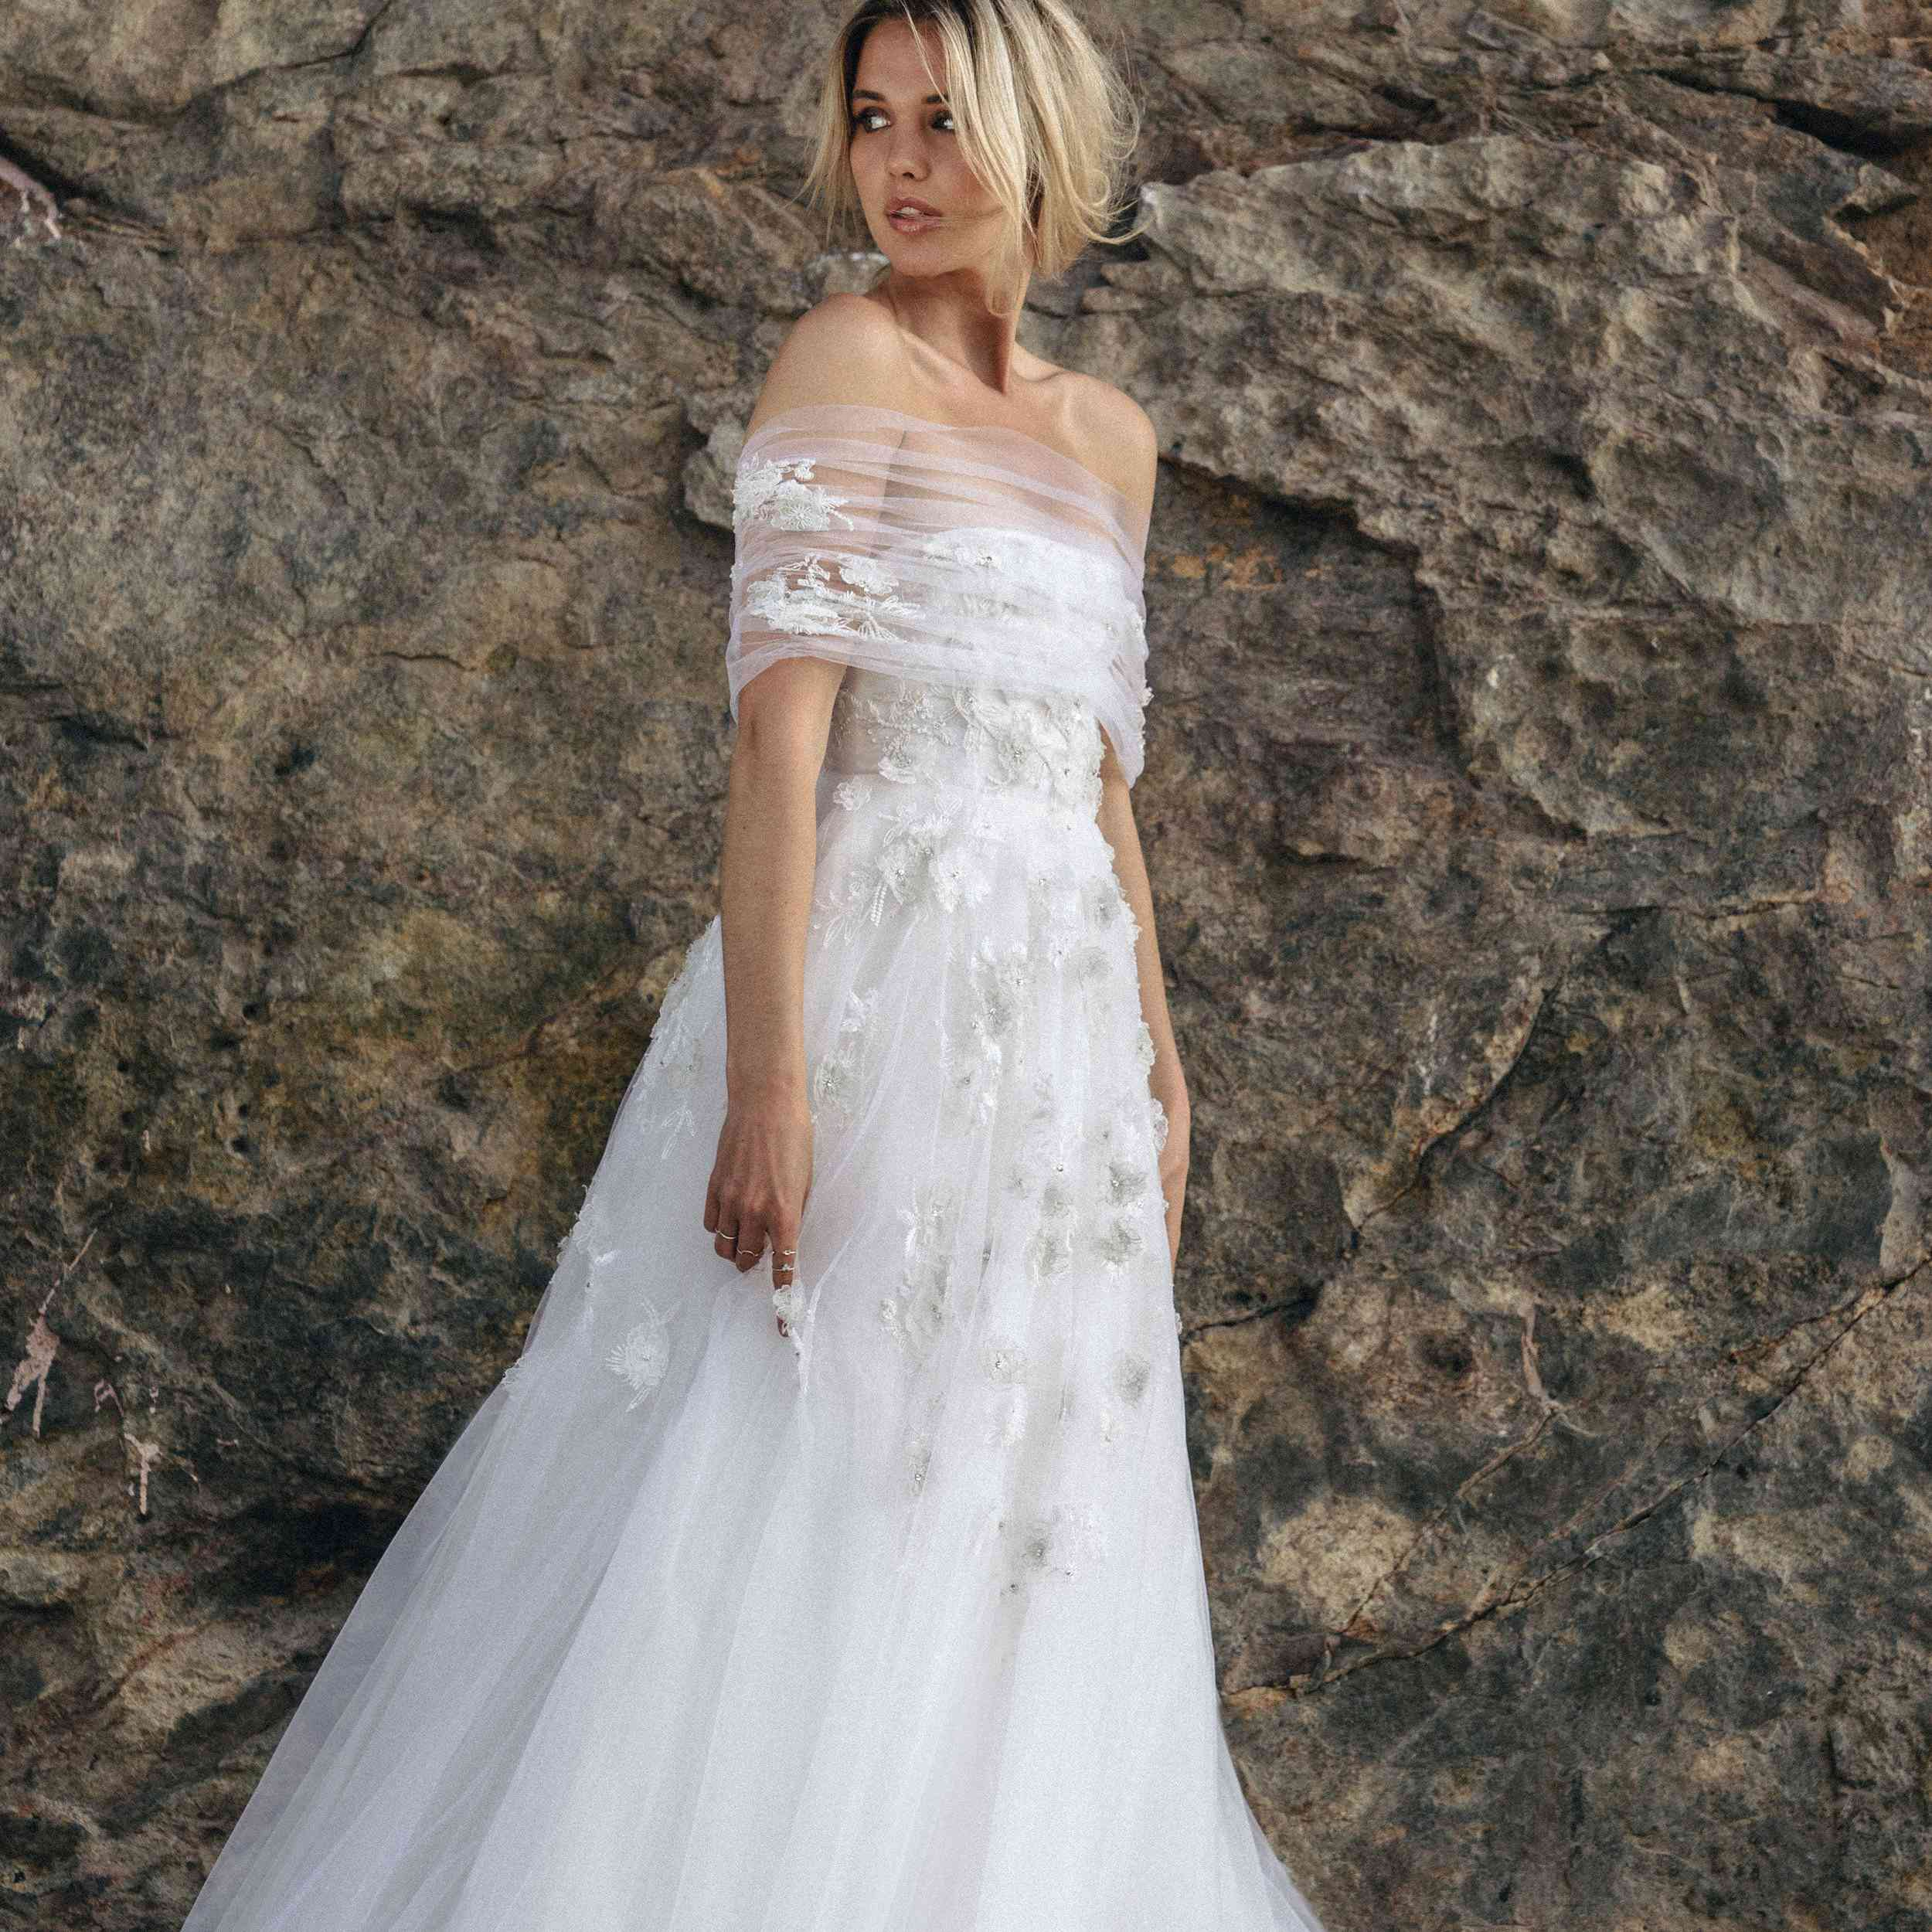 Model in tulle off-the-shoulder dress with floral applique